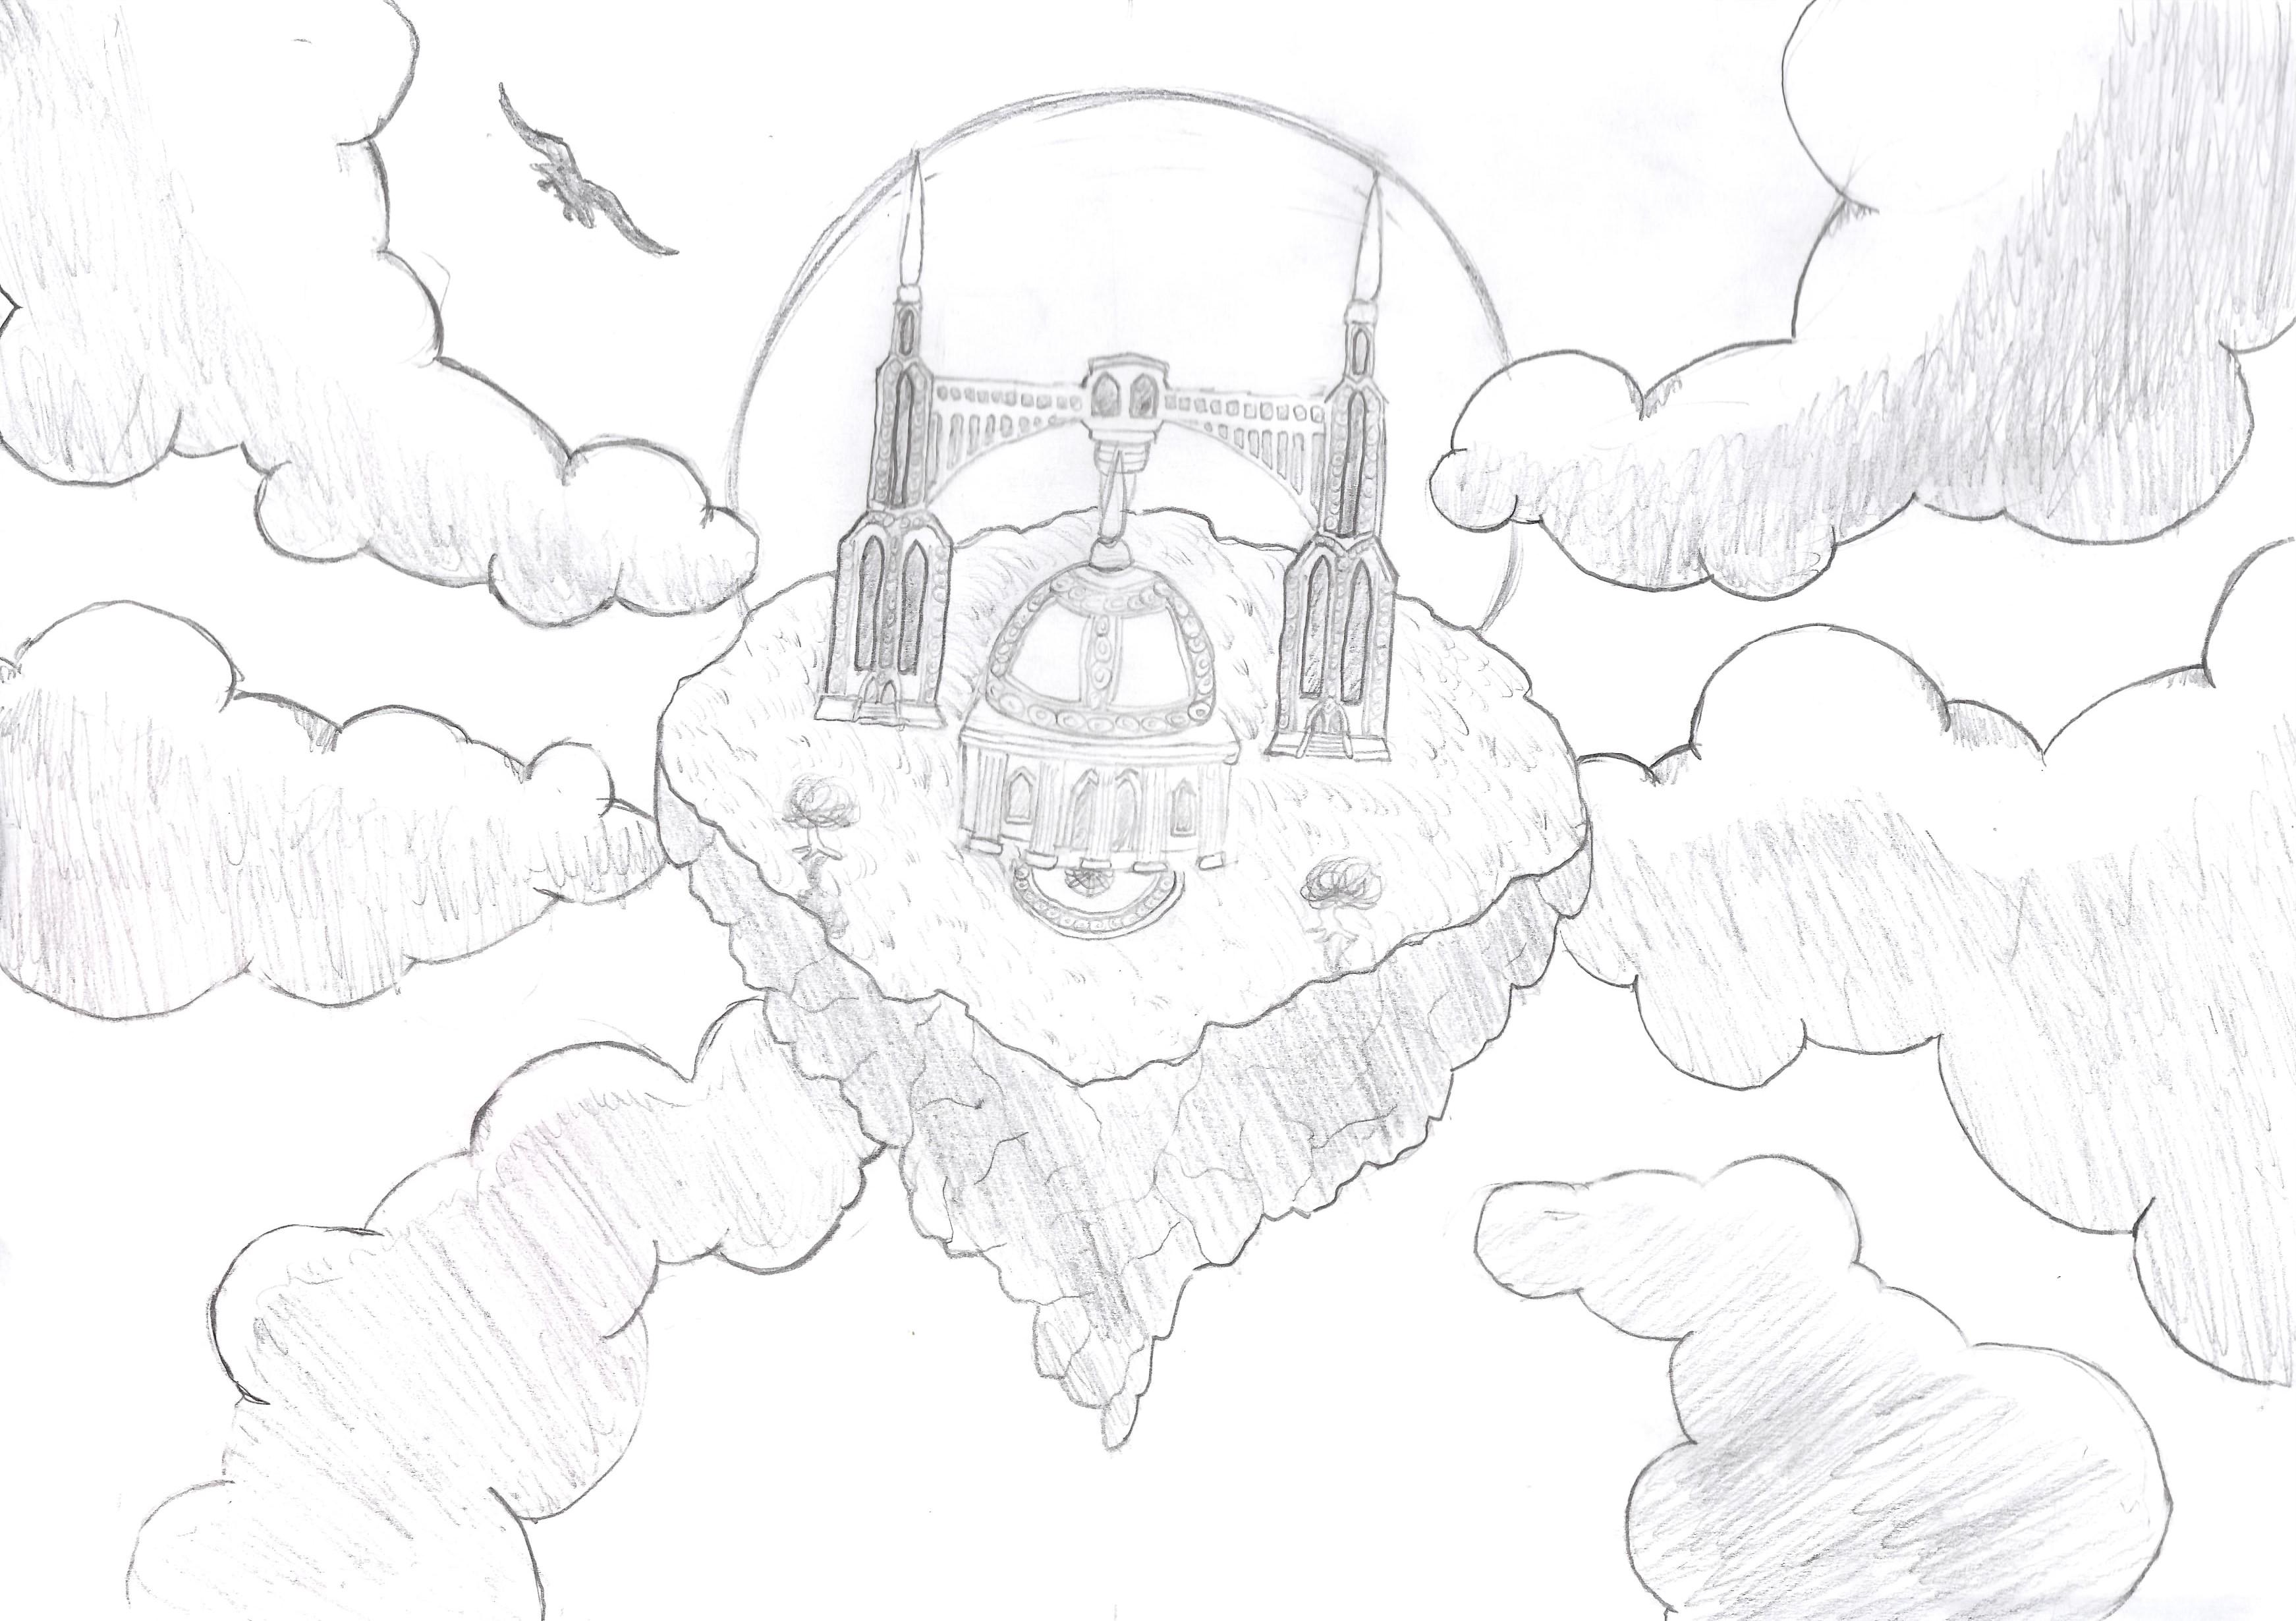 Dessin Le Temple du Ciel de MathDream